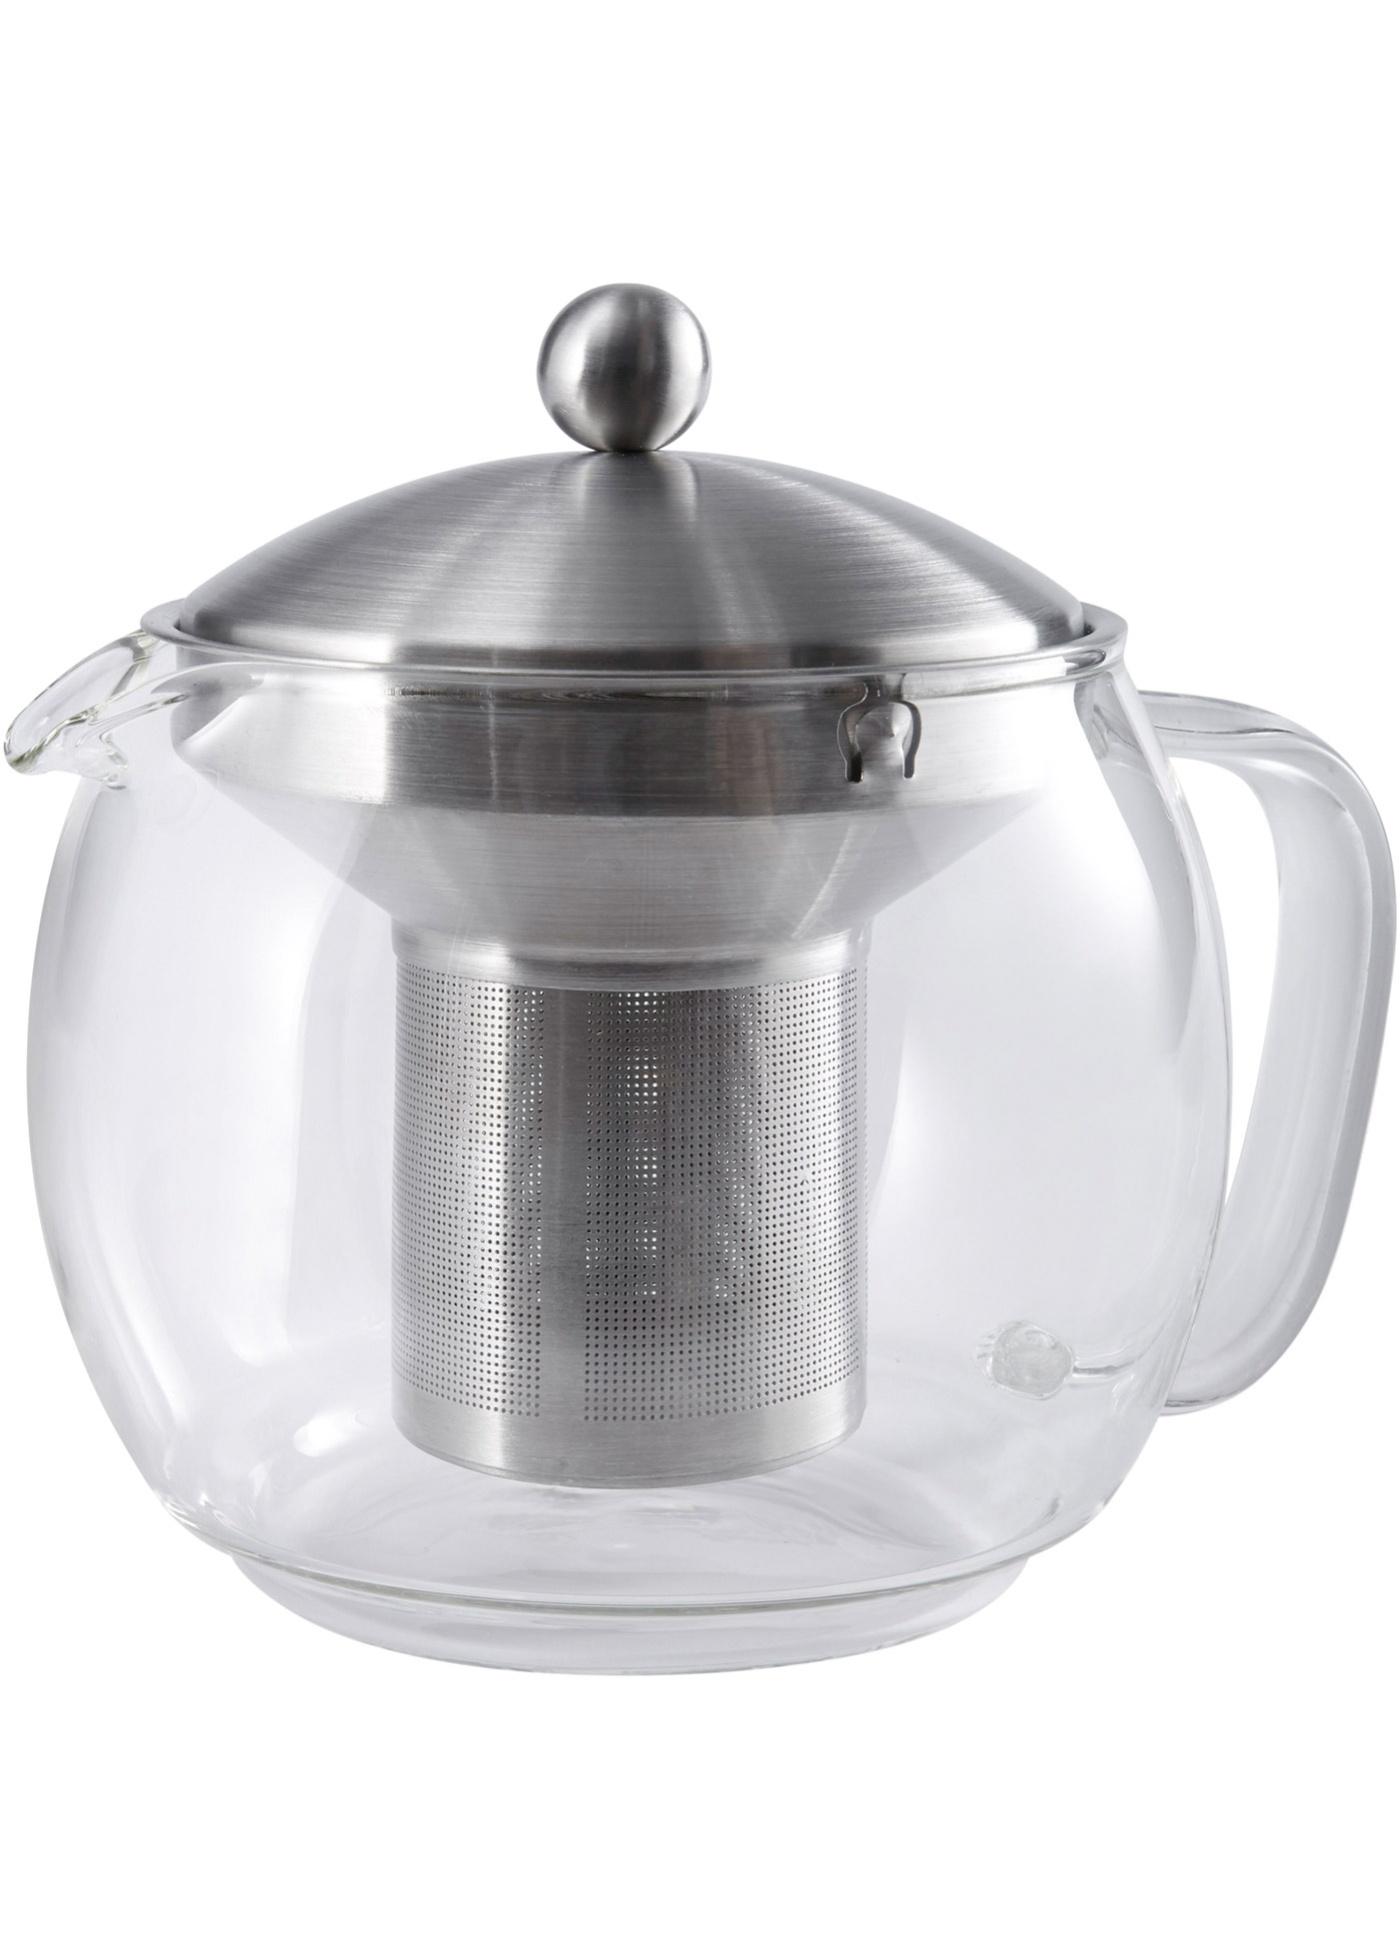 bpc living bonprix collection Tekanna med filterinsats Teatime